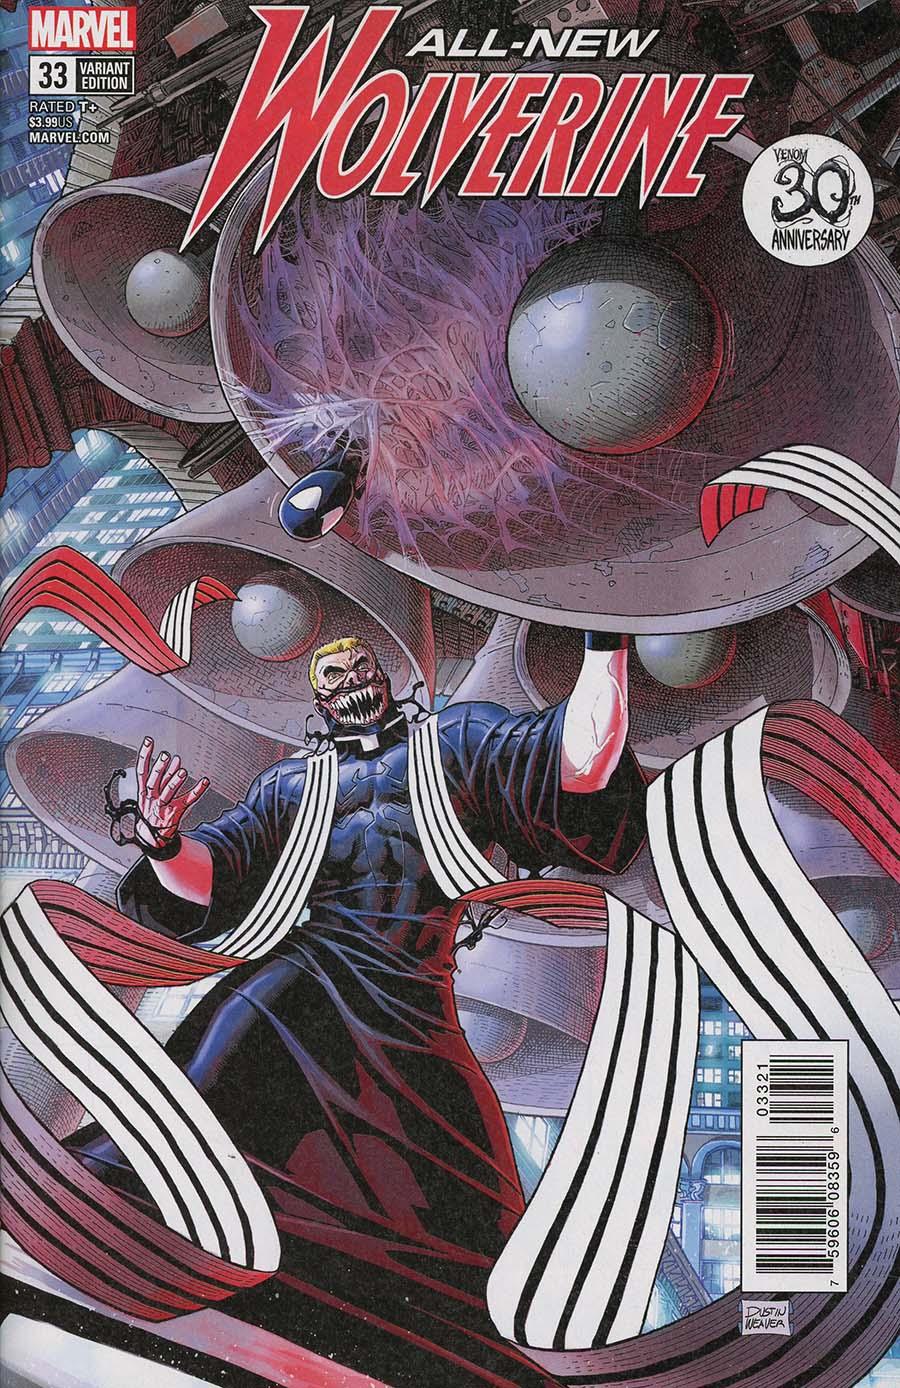 All-New Wolverine #33 Cover B Variant Dustin Weaver Venom 30th Anniversary Cover